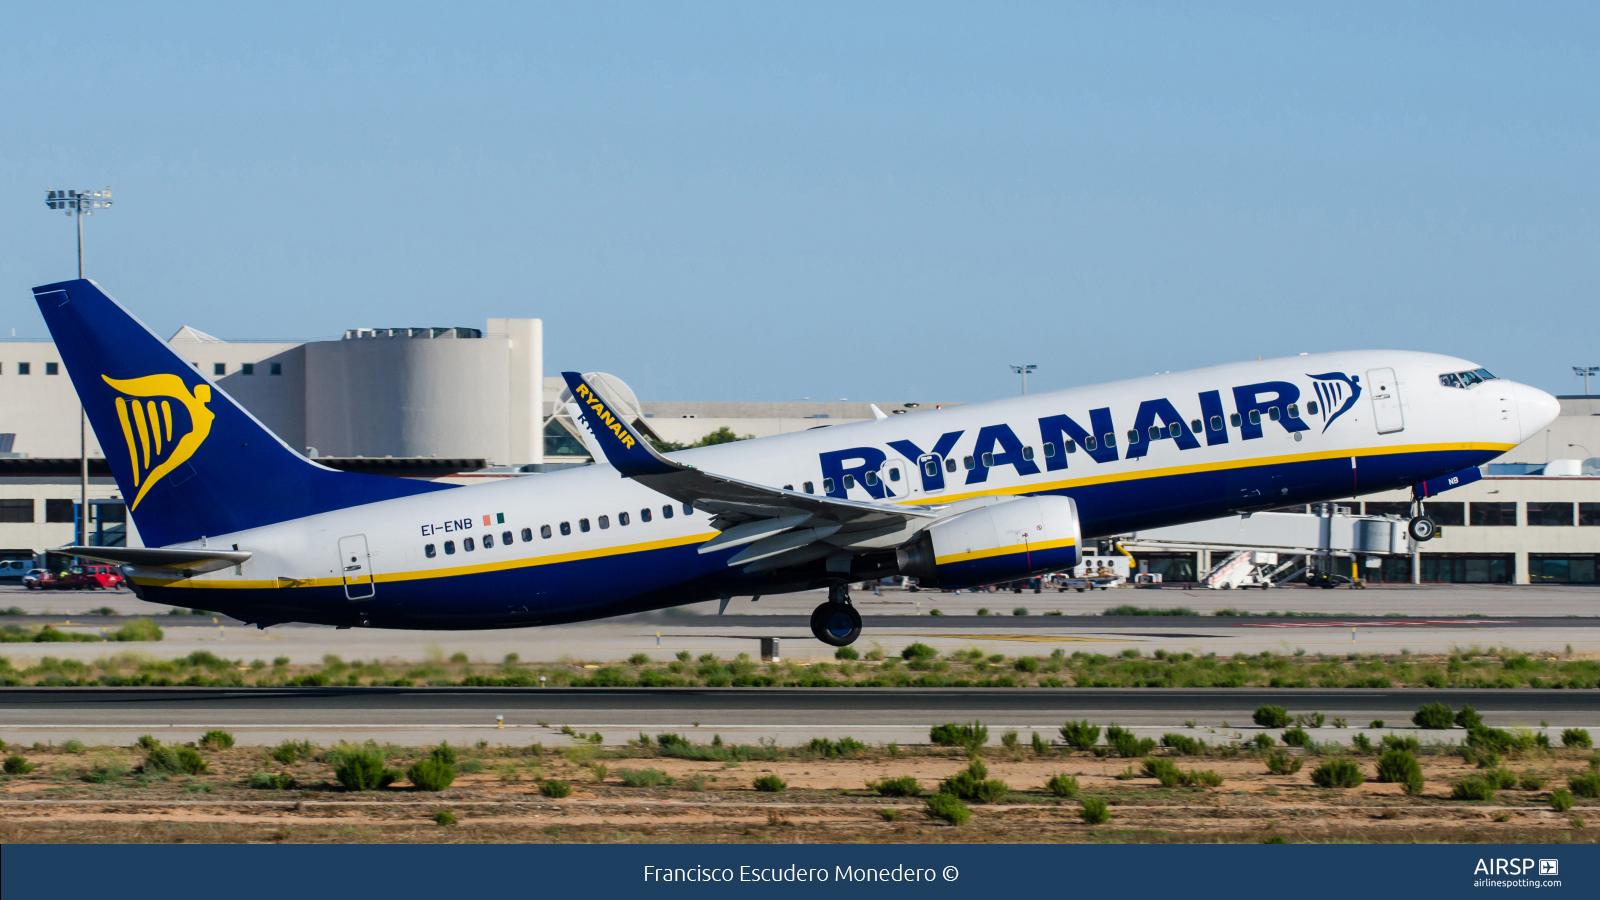 RyanairBoeing 737-800EI-ENB